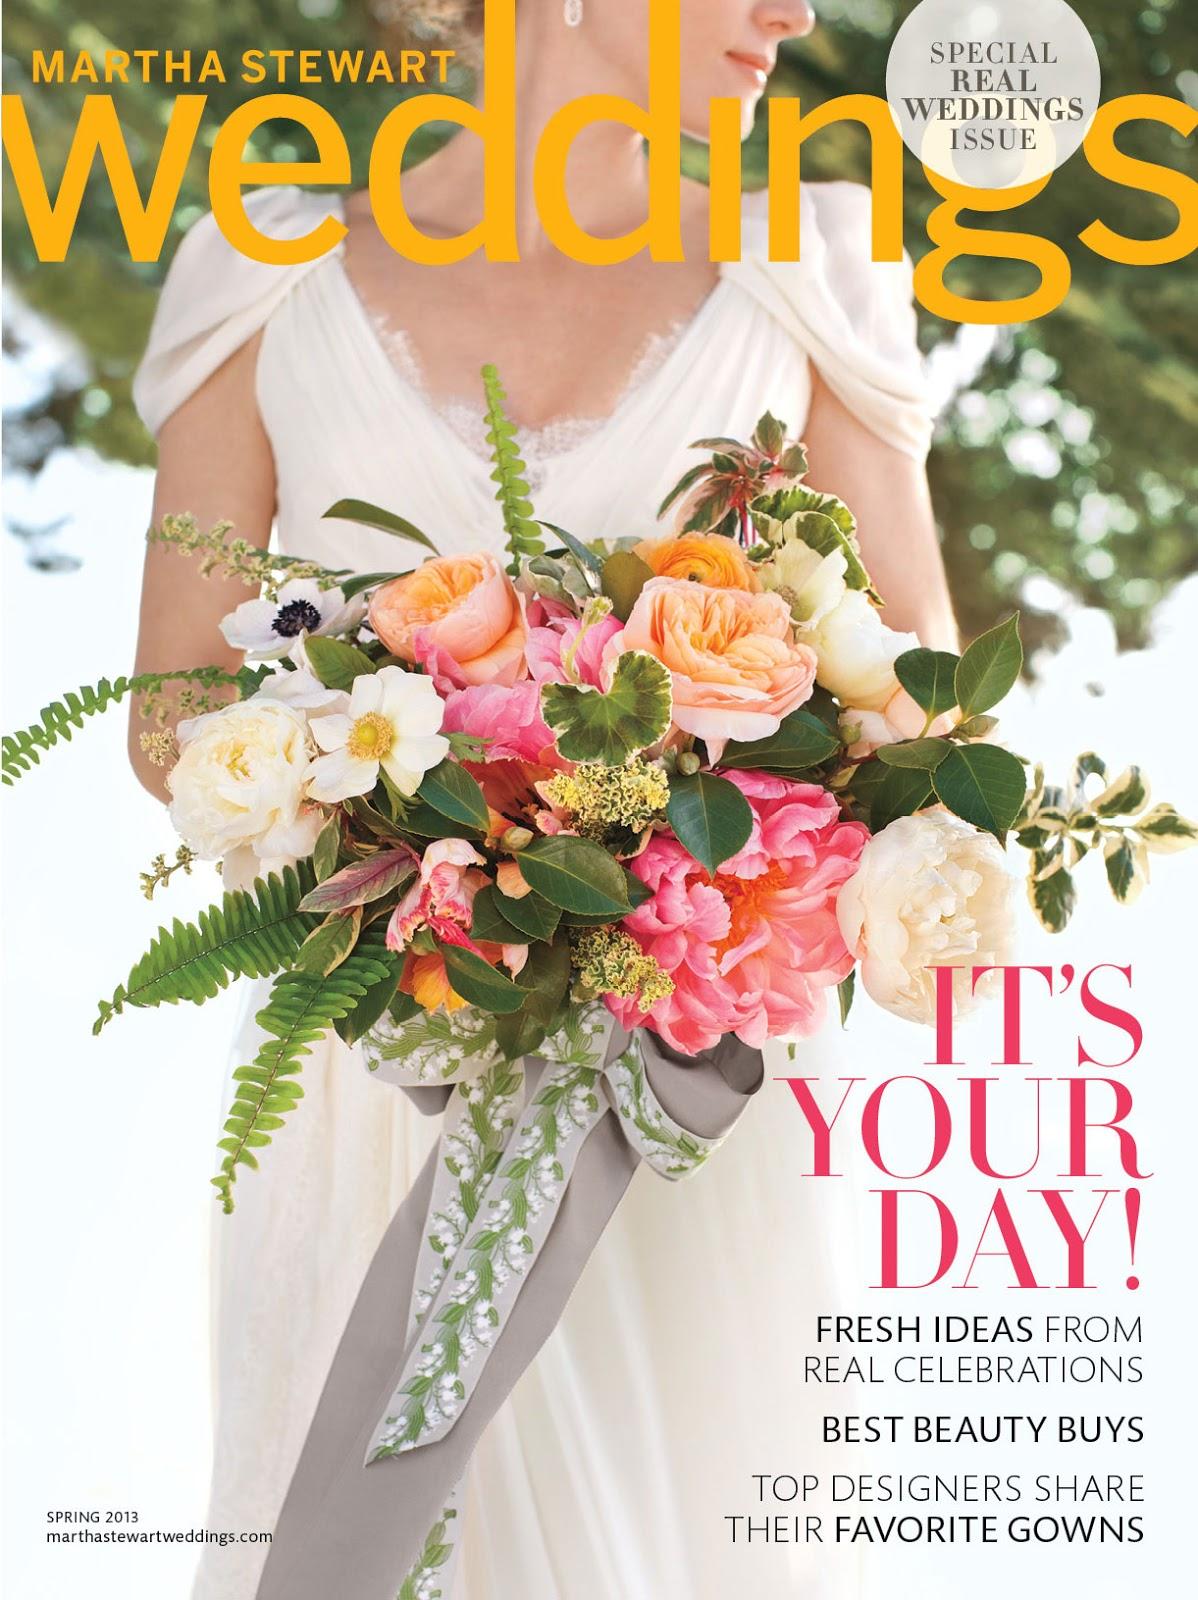 Paper Hounds Martha Stewart Weddings Spring 2013